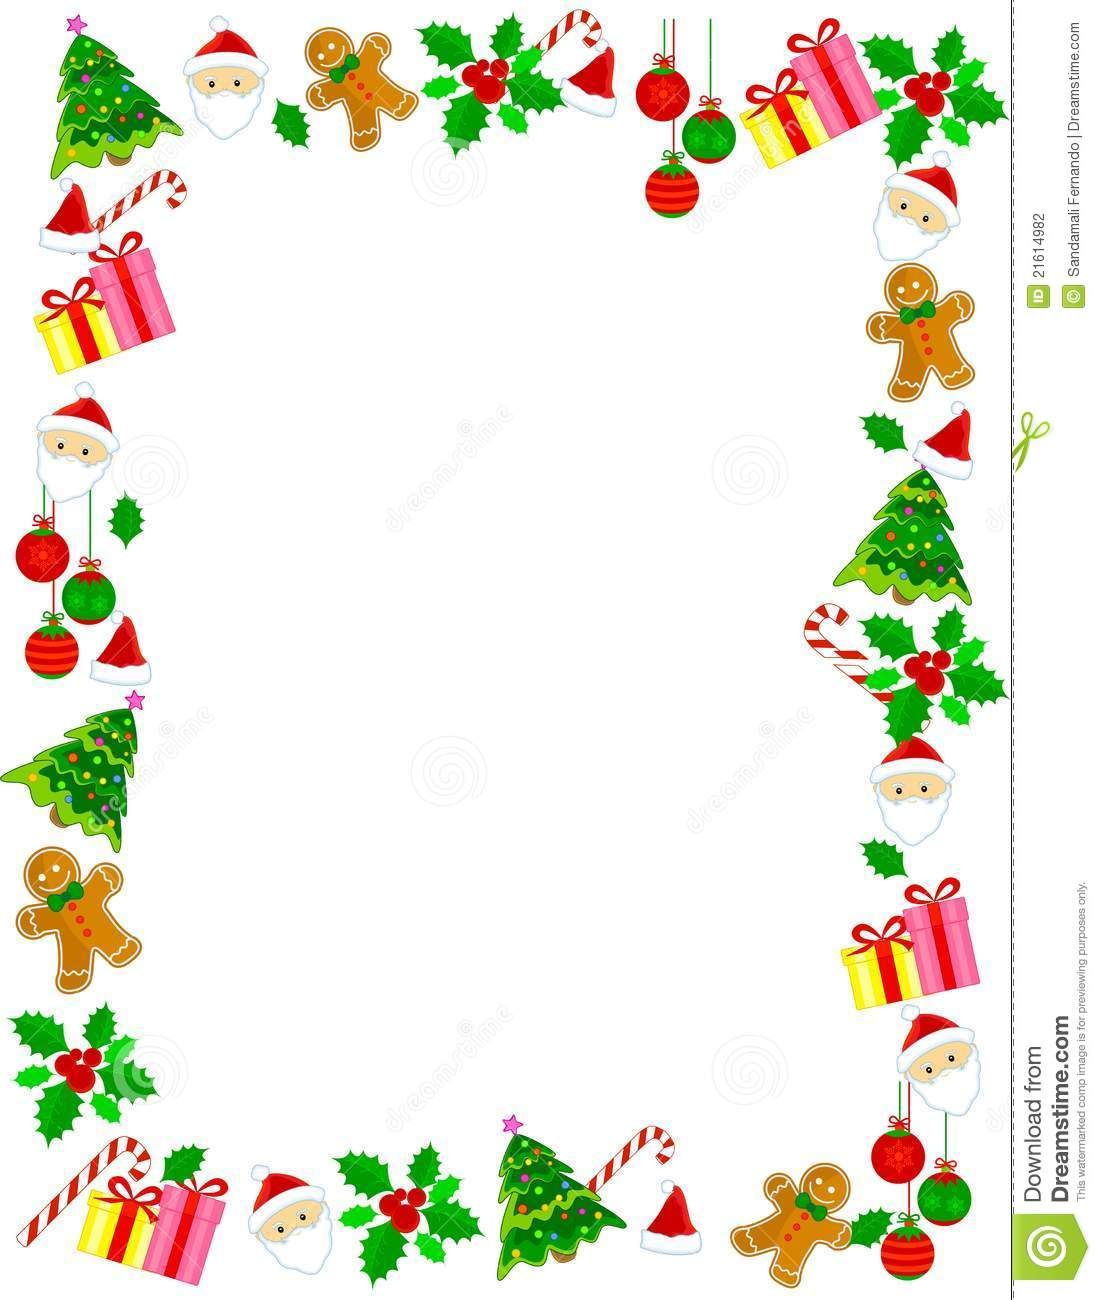 Christmas Border / Frame - Download From Over 50 Million High - Free Printable Christmas Frames And Borders